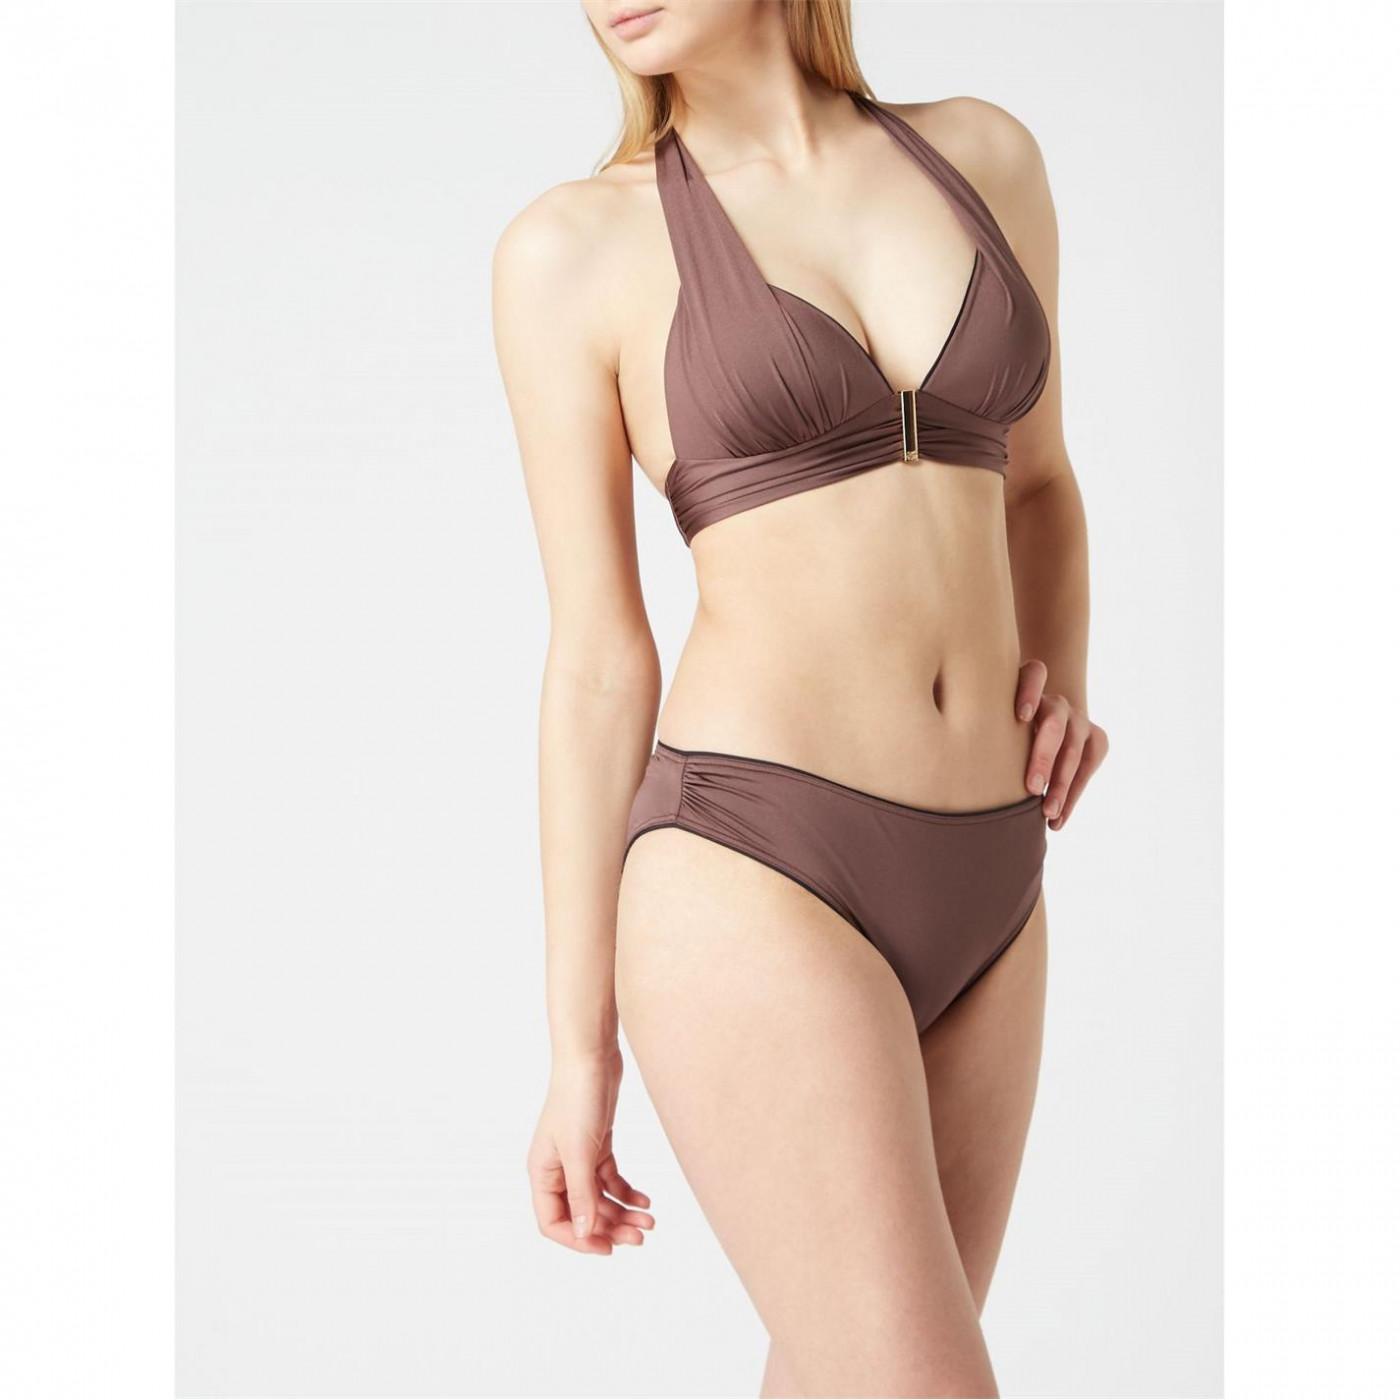 Sophie bikini store, bondage by request torrent